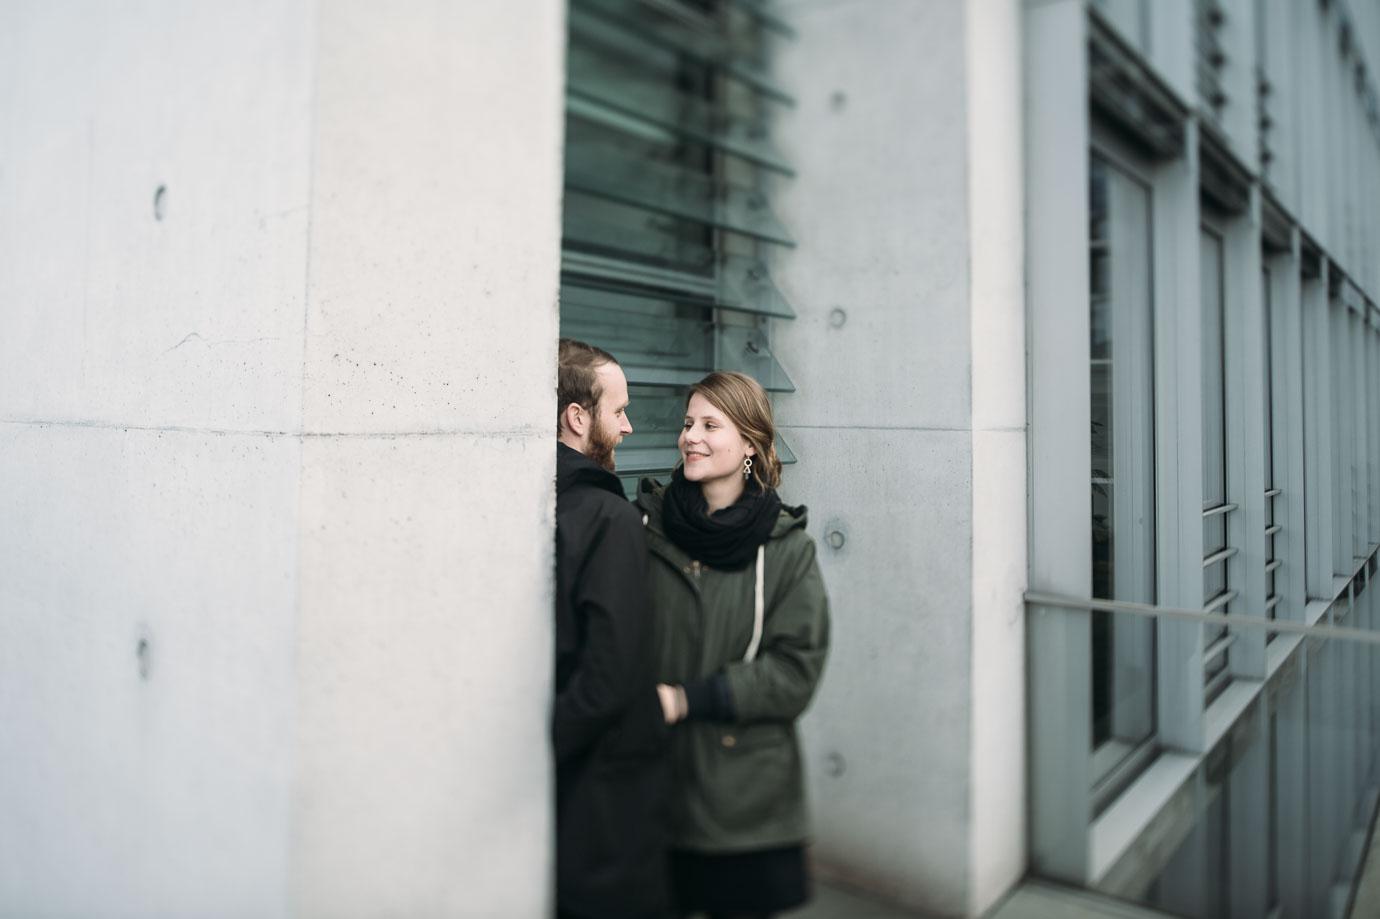 hochzeitsfotograf_andreas_jacob_rosenheim_berlin_b-2